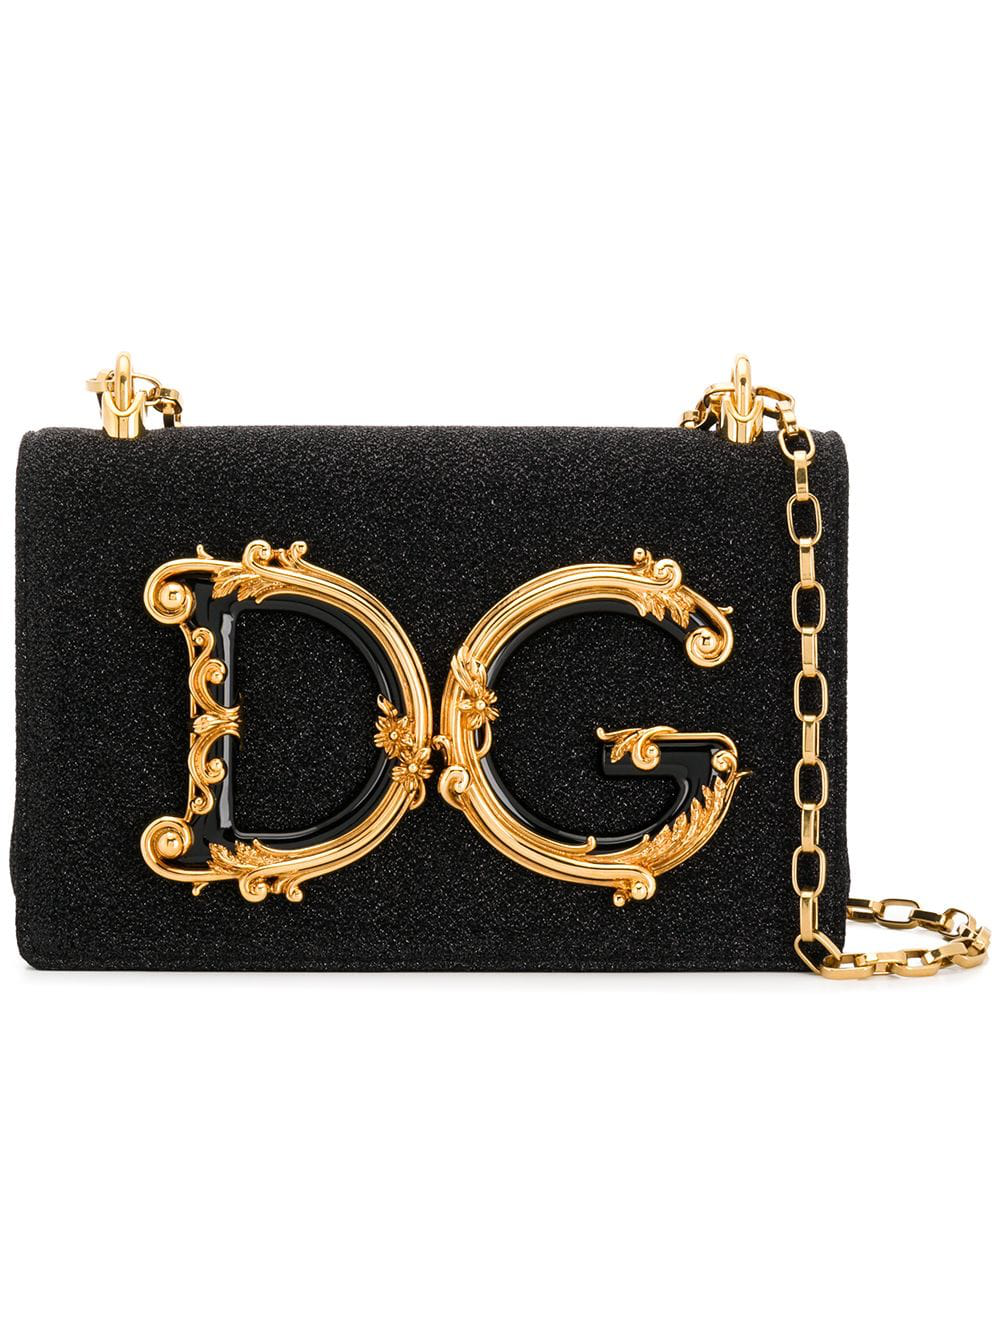 c96bca8b22c8 Dolce & Gabbana Dg Girls Coss-Body Bag In Soft Lurex In 8H965 Lure Nero